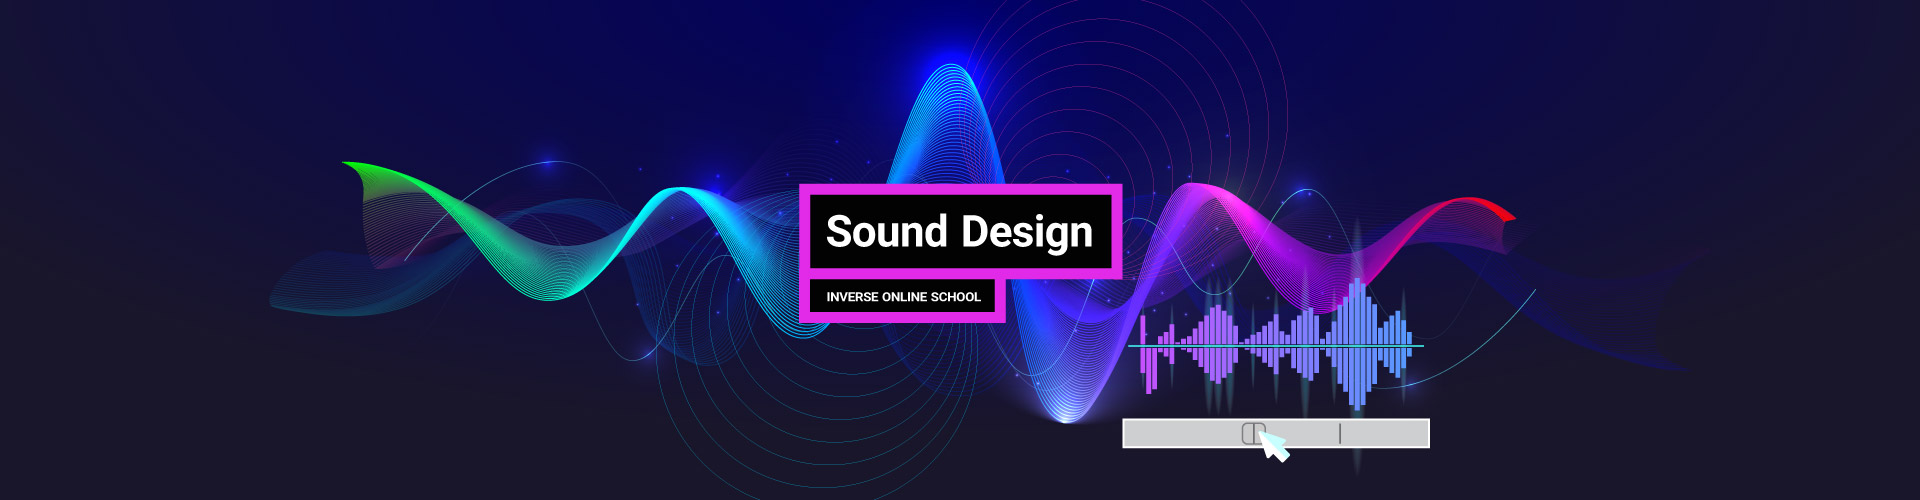 دوره آنلاین طراحی صدا